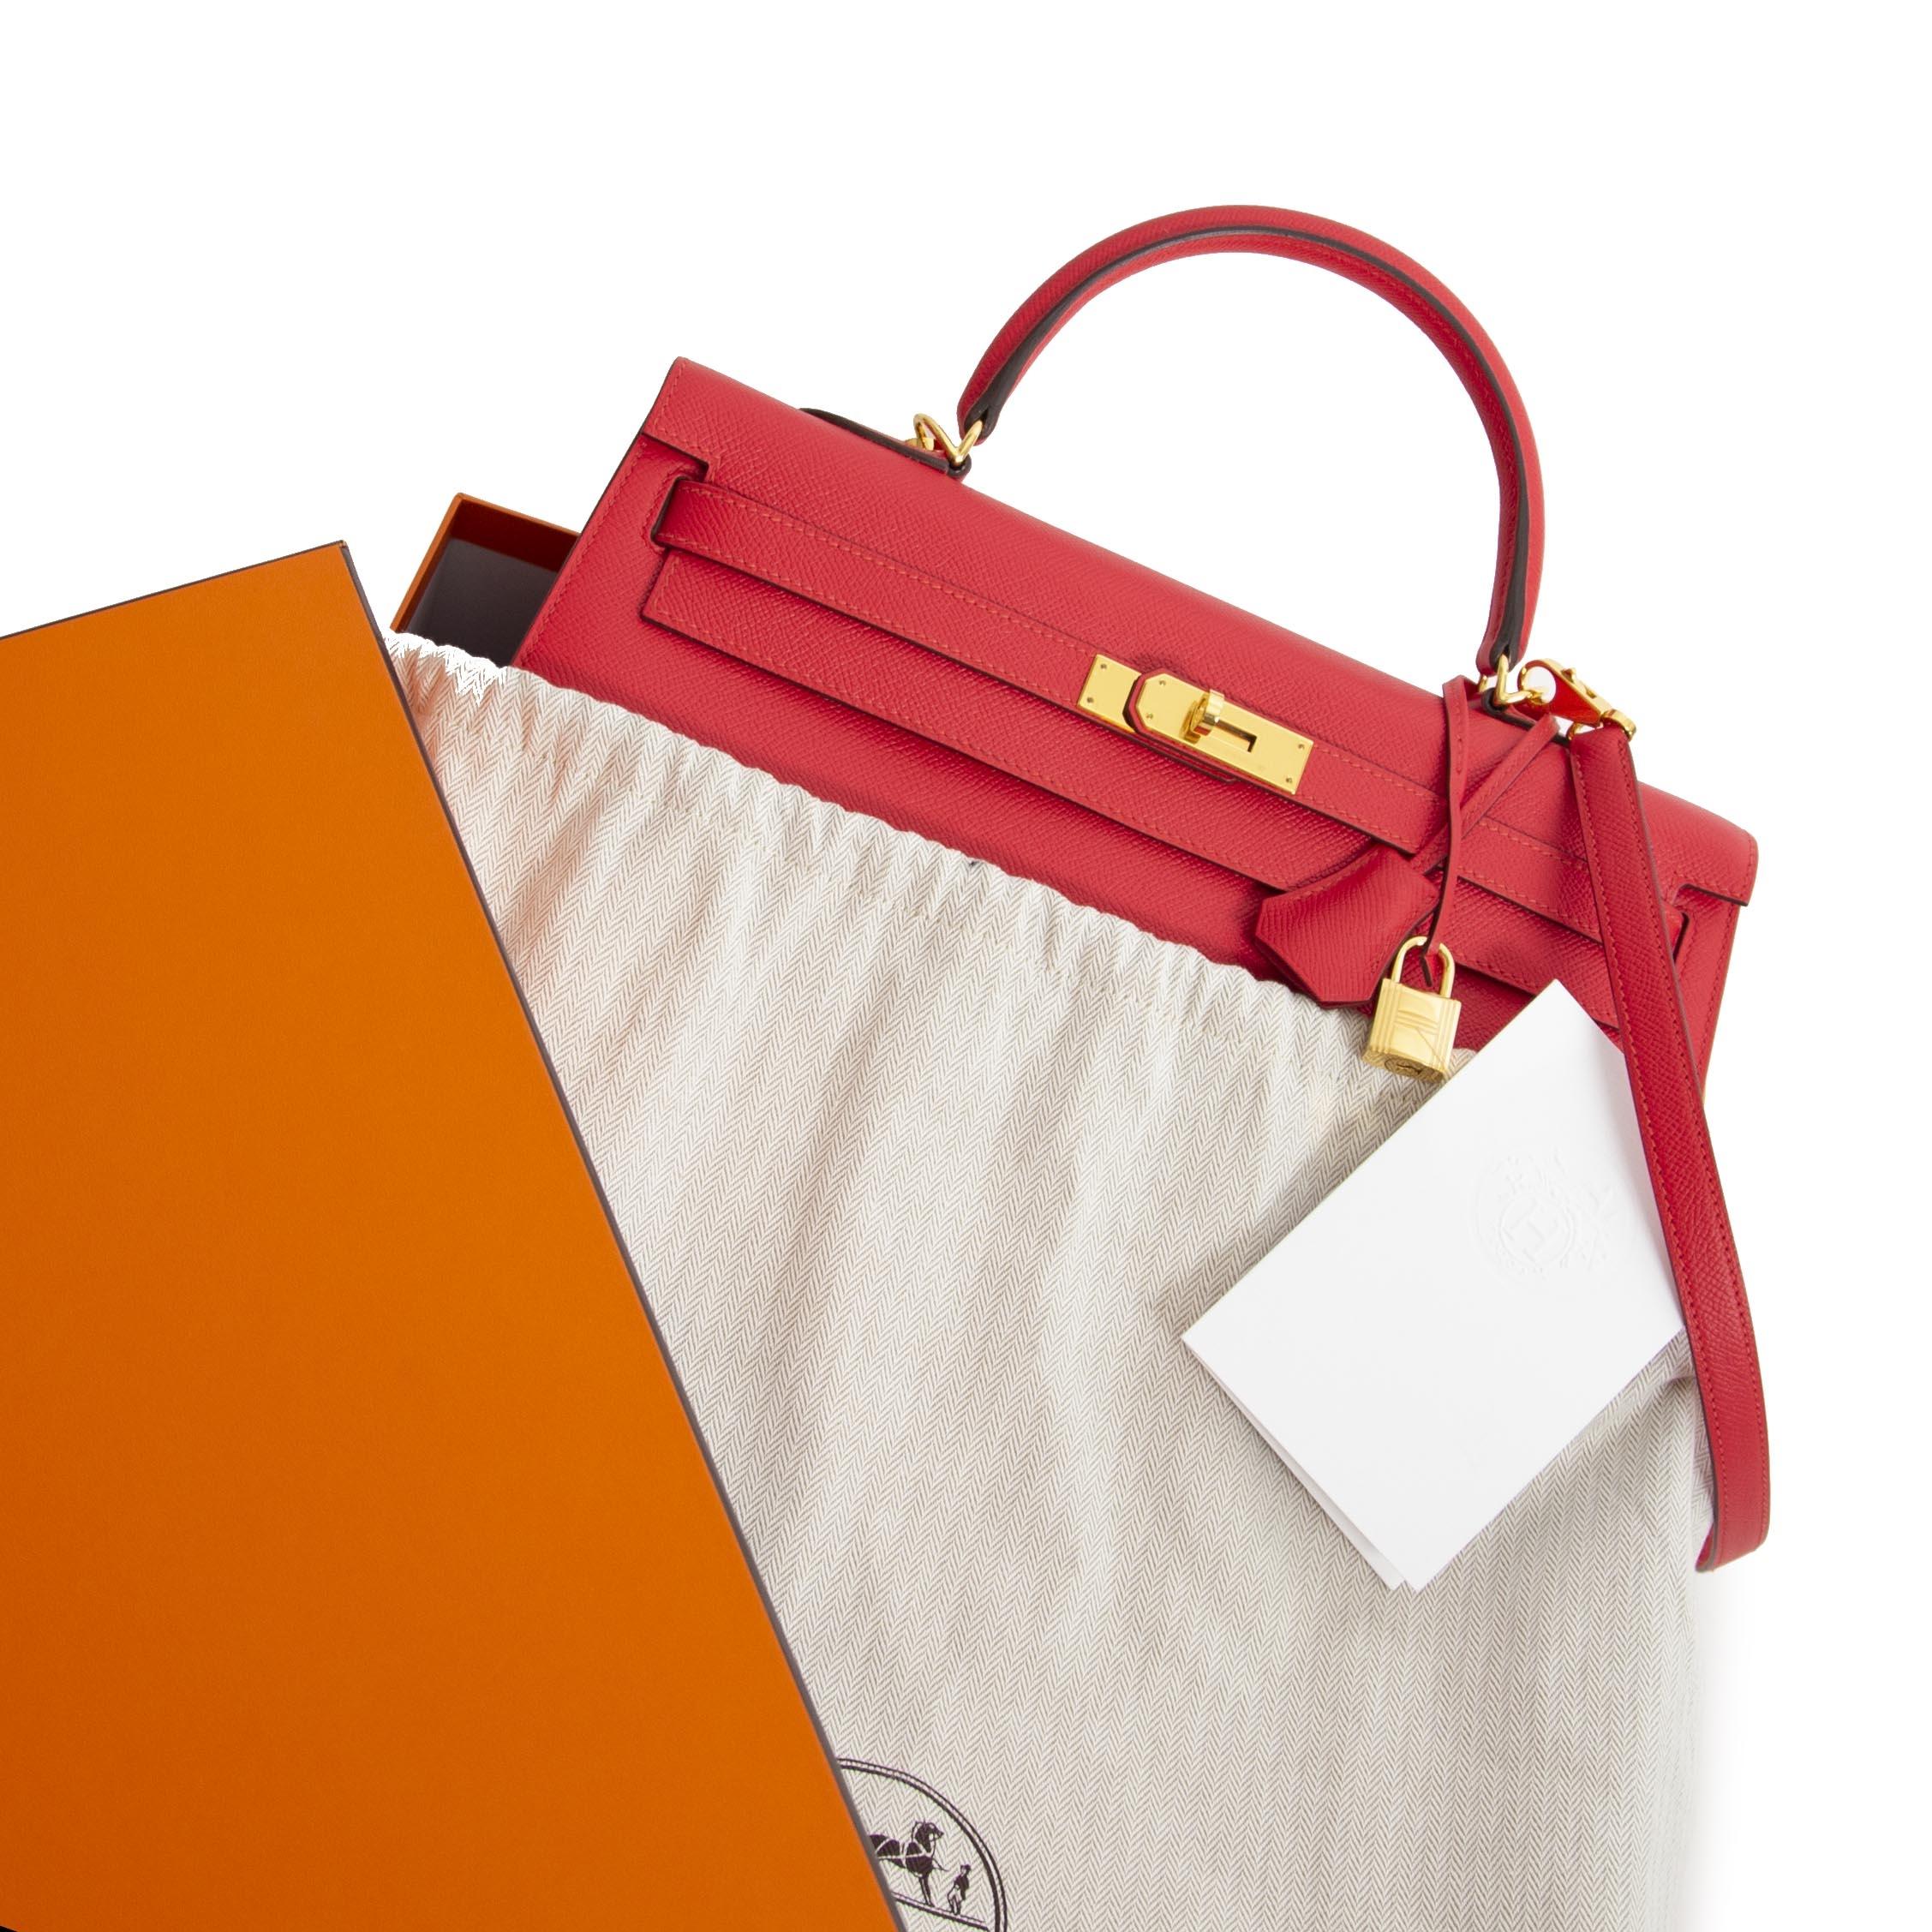 As New Hermès Kelly 35 Sellier Rouge Tomate PHW